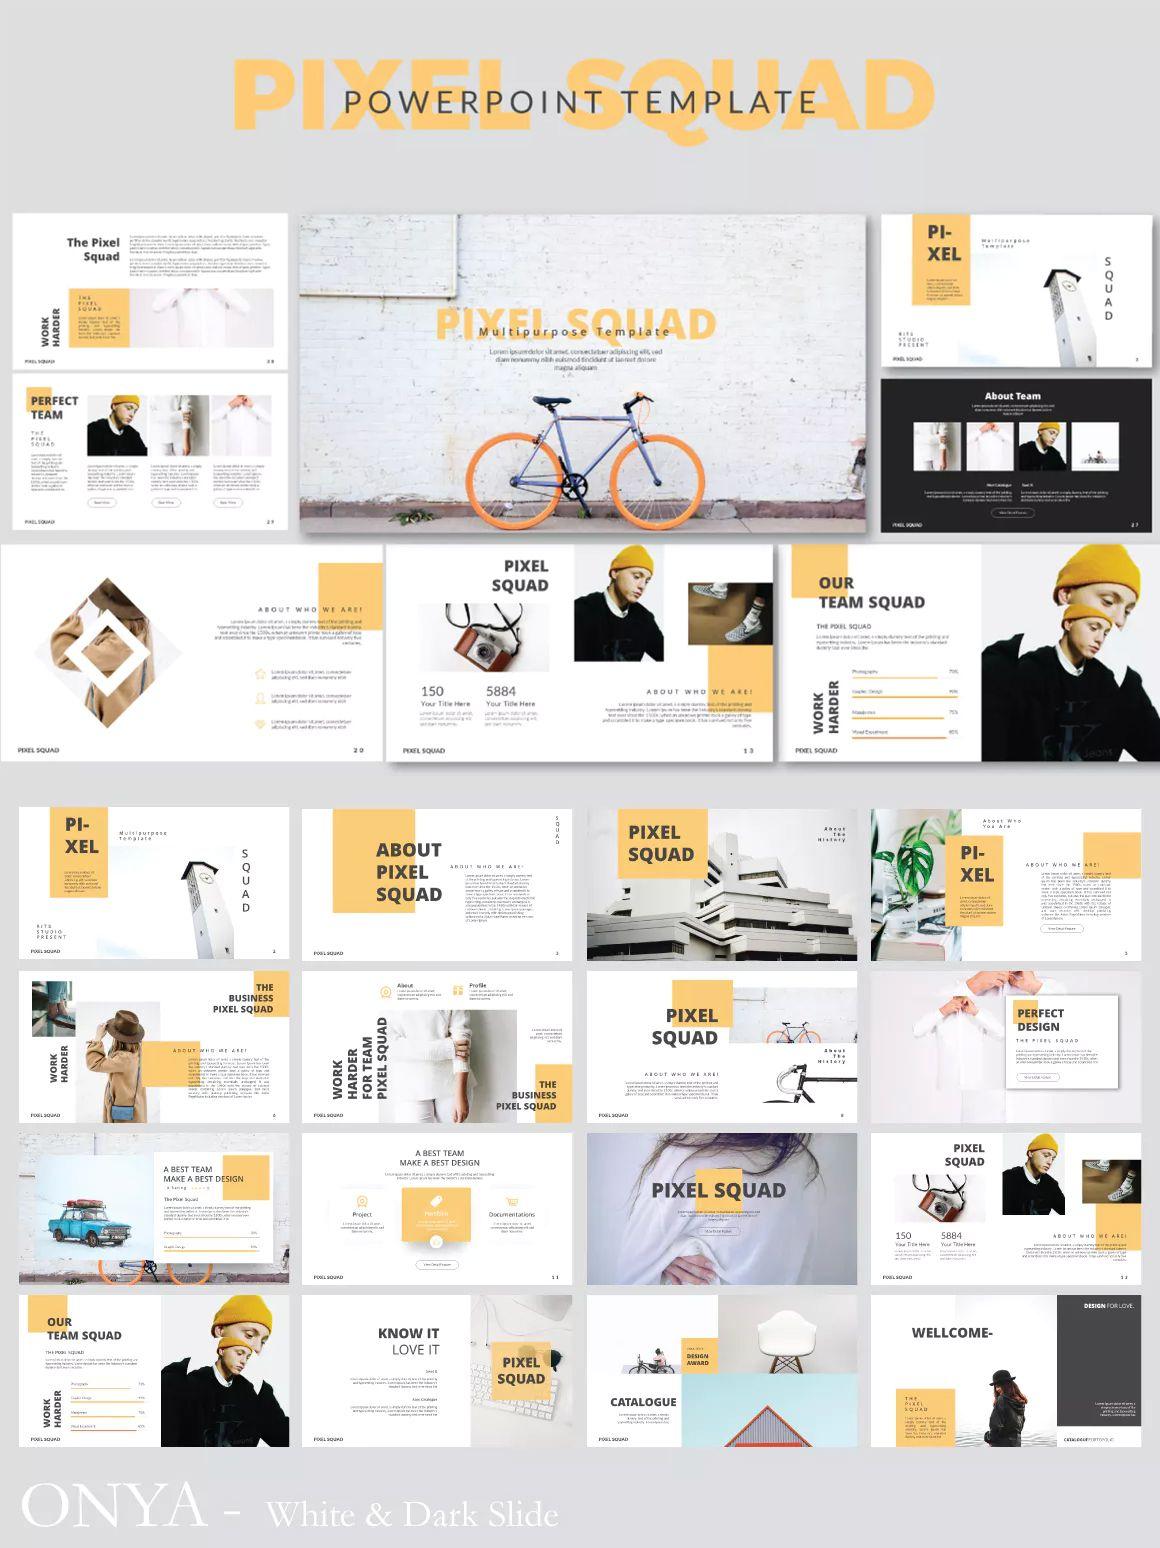 Pixma Squad Powerpoint Presentation Template Powerpoint Prasentation Broschurendesign Design Web